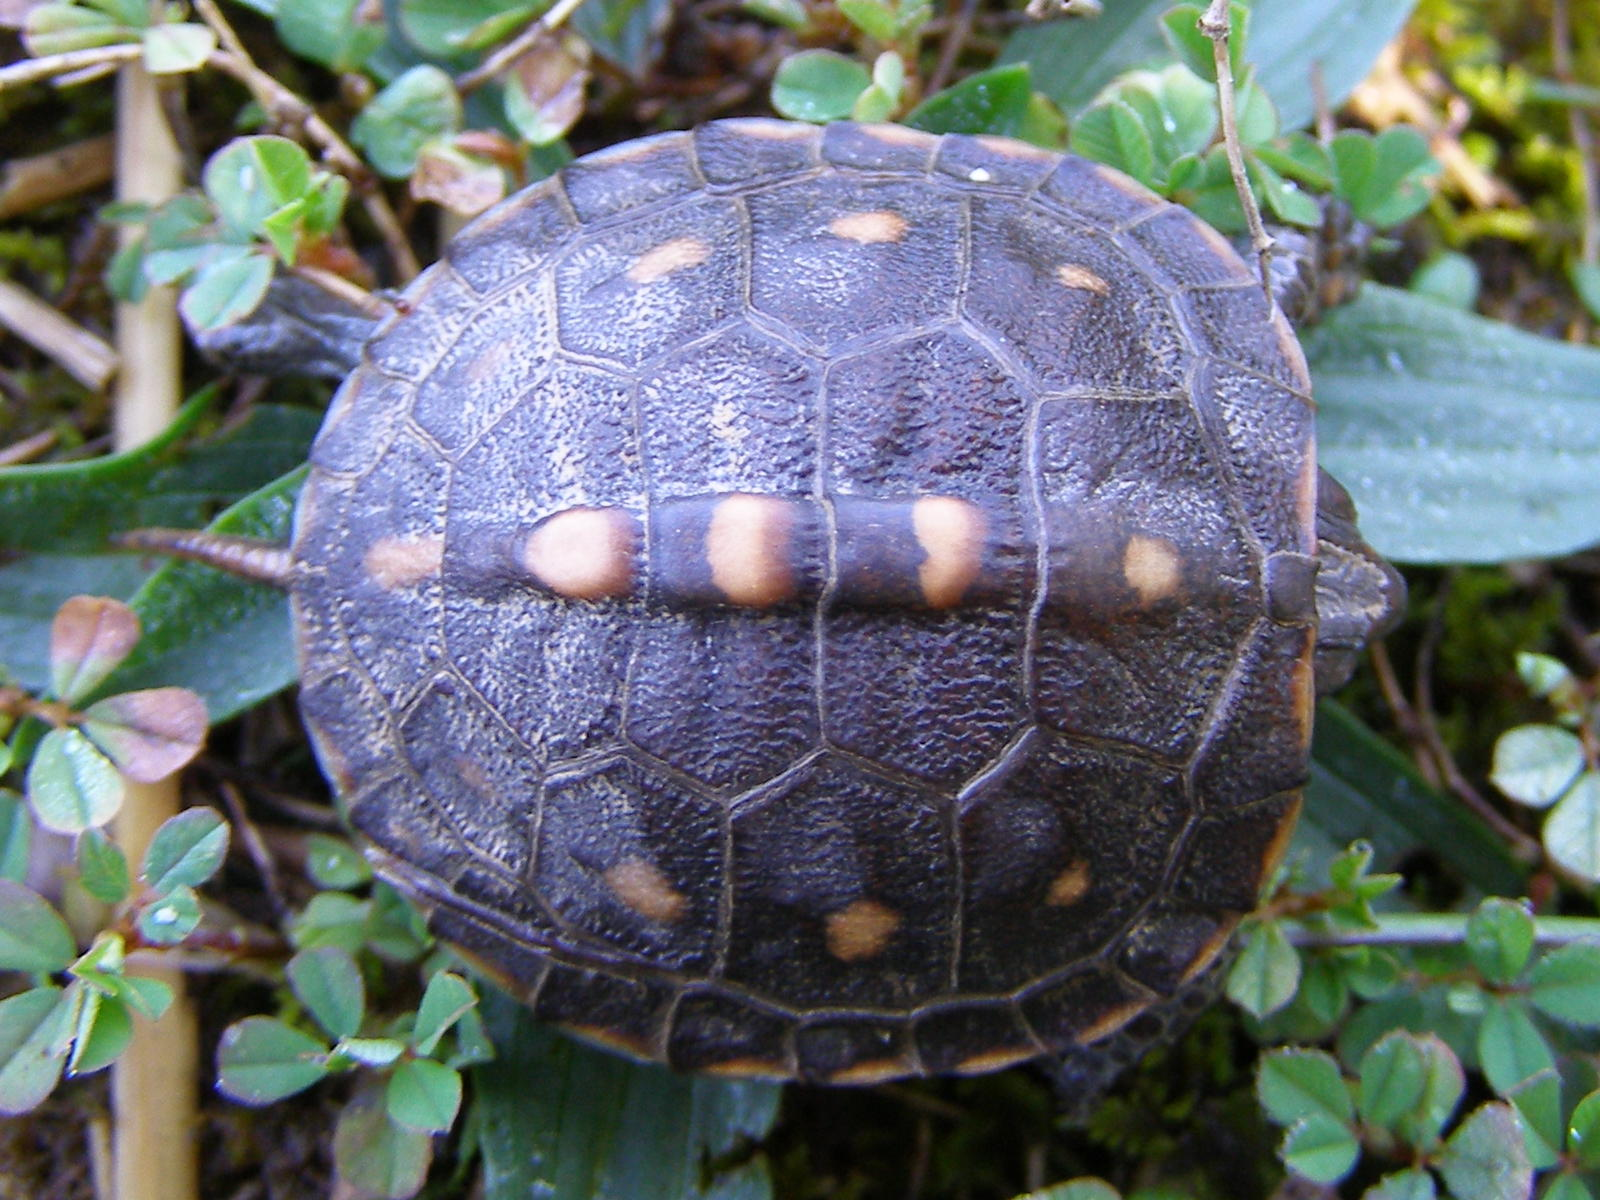 Blue baby turtles - photo#15